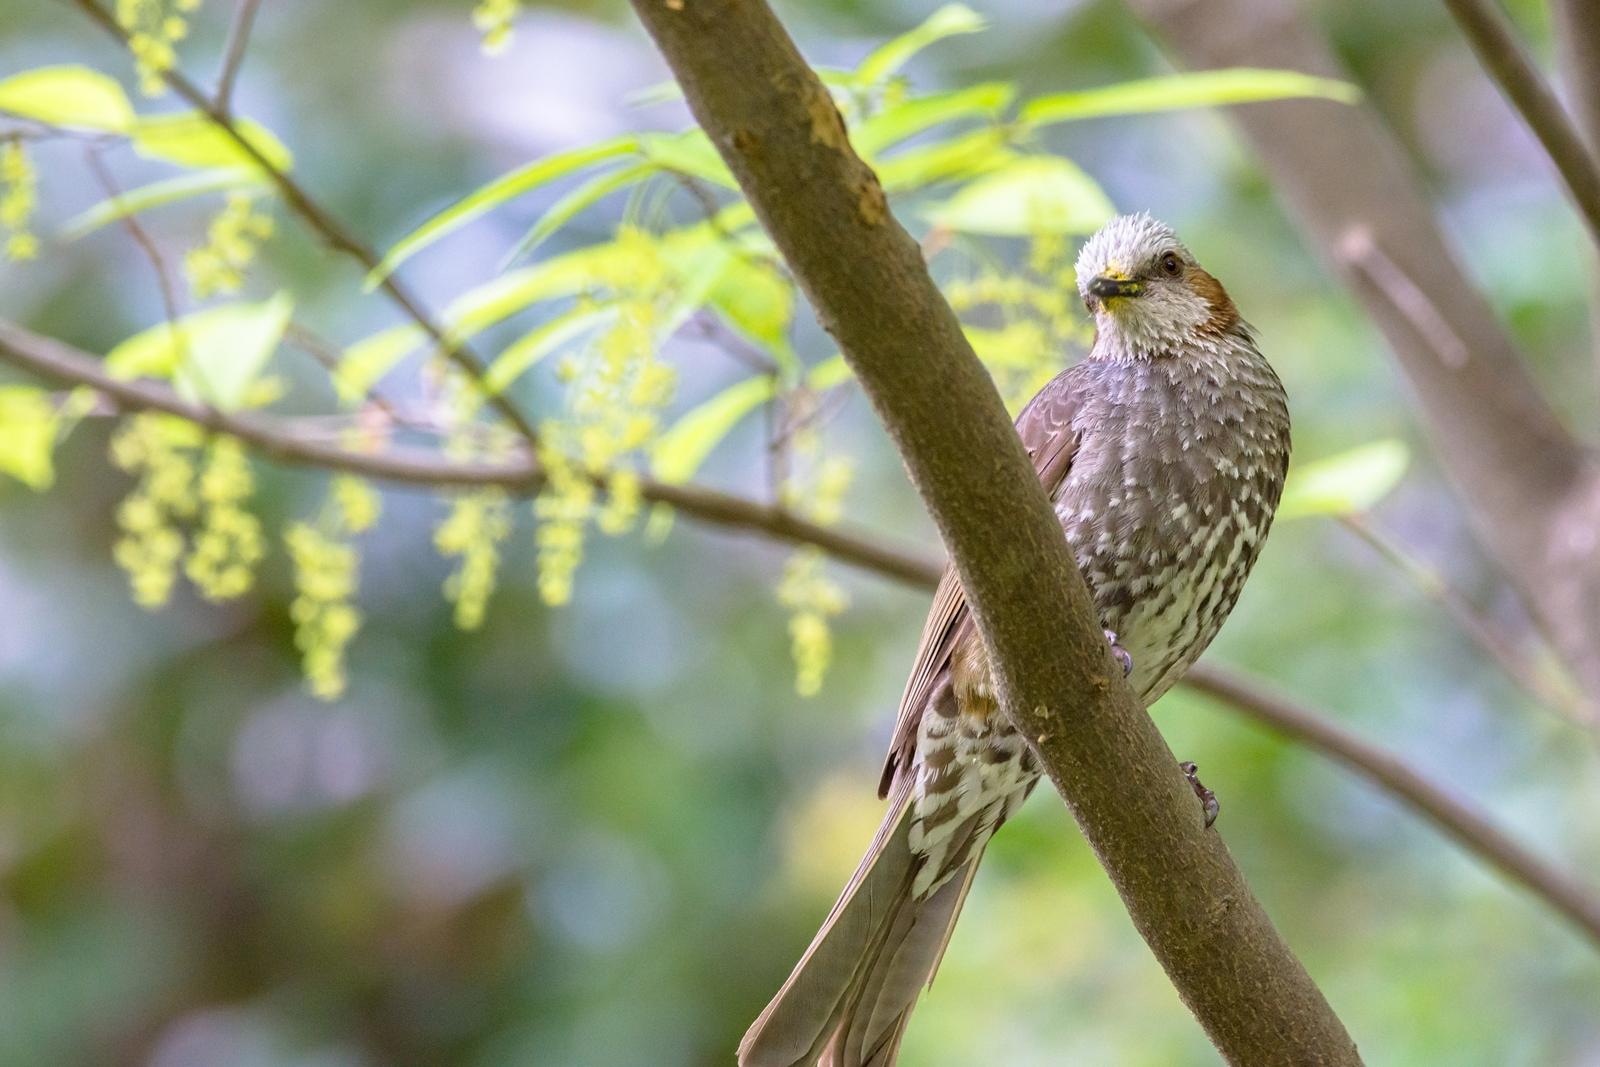 Photo: 「心地よい色」 / Pleasant color.  溢れだす命の色 輝かしくて 心地よくて それはとても優しい色  Brown-eared Bulbul. (ヒヨドリ)  Nikon D7200 SIGMA 150-600mm F5-6.3 DG OS HSM Contemporary  #birdphotography #birds #kawaii #ことり #小鳥 #nikon #sigma  ( http://takafumiooshio.com/archives/2442 )